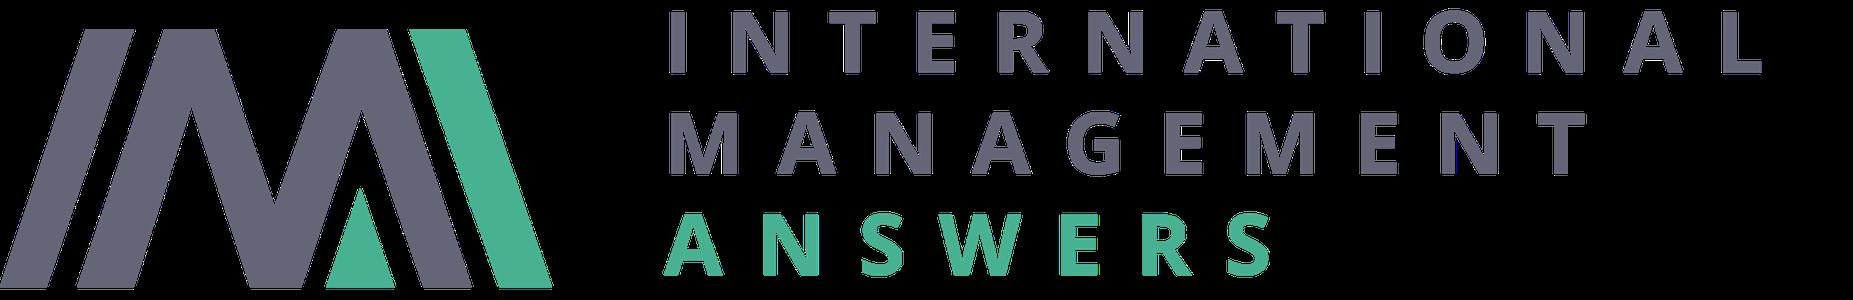 International Management Answers (IMA) Ltd